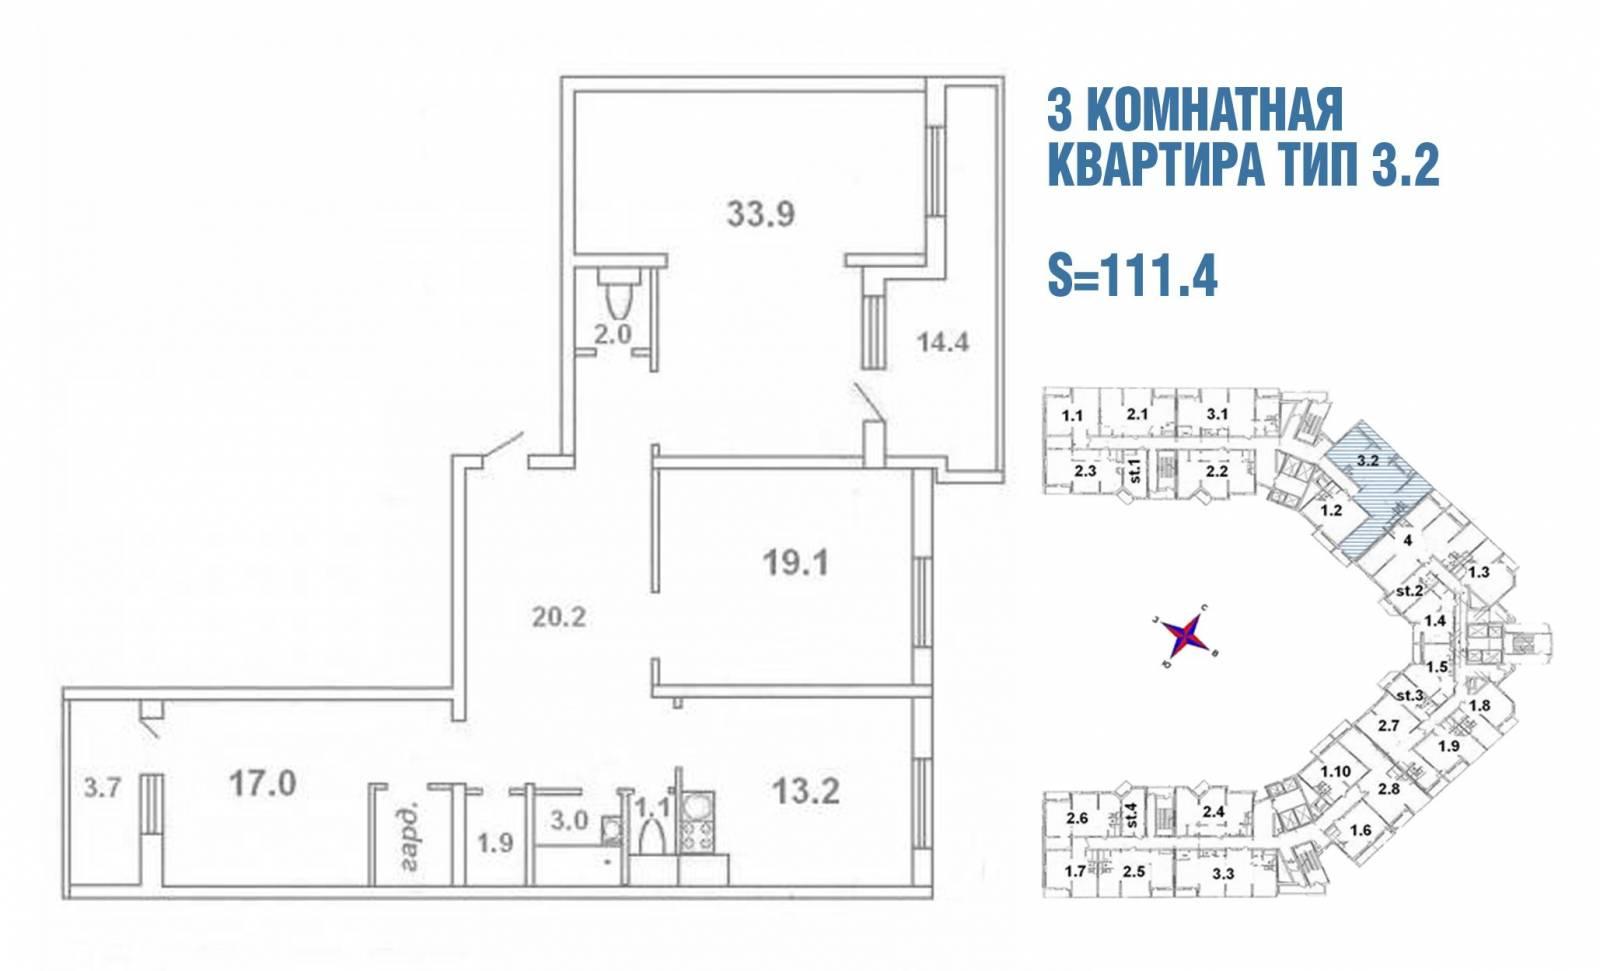 3-х комнатная квартира тип 3.2 - 111,4 кв.м.